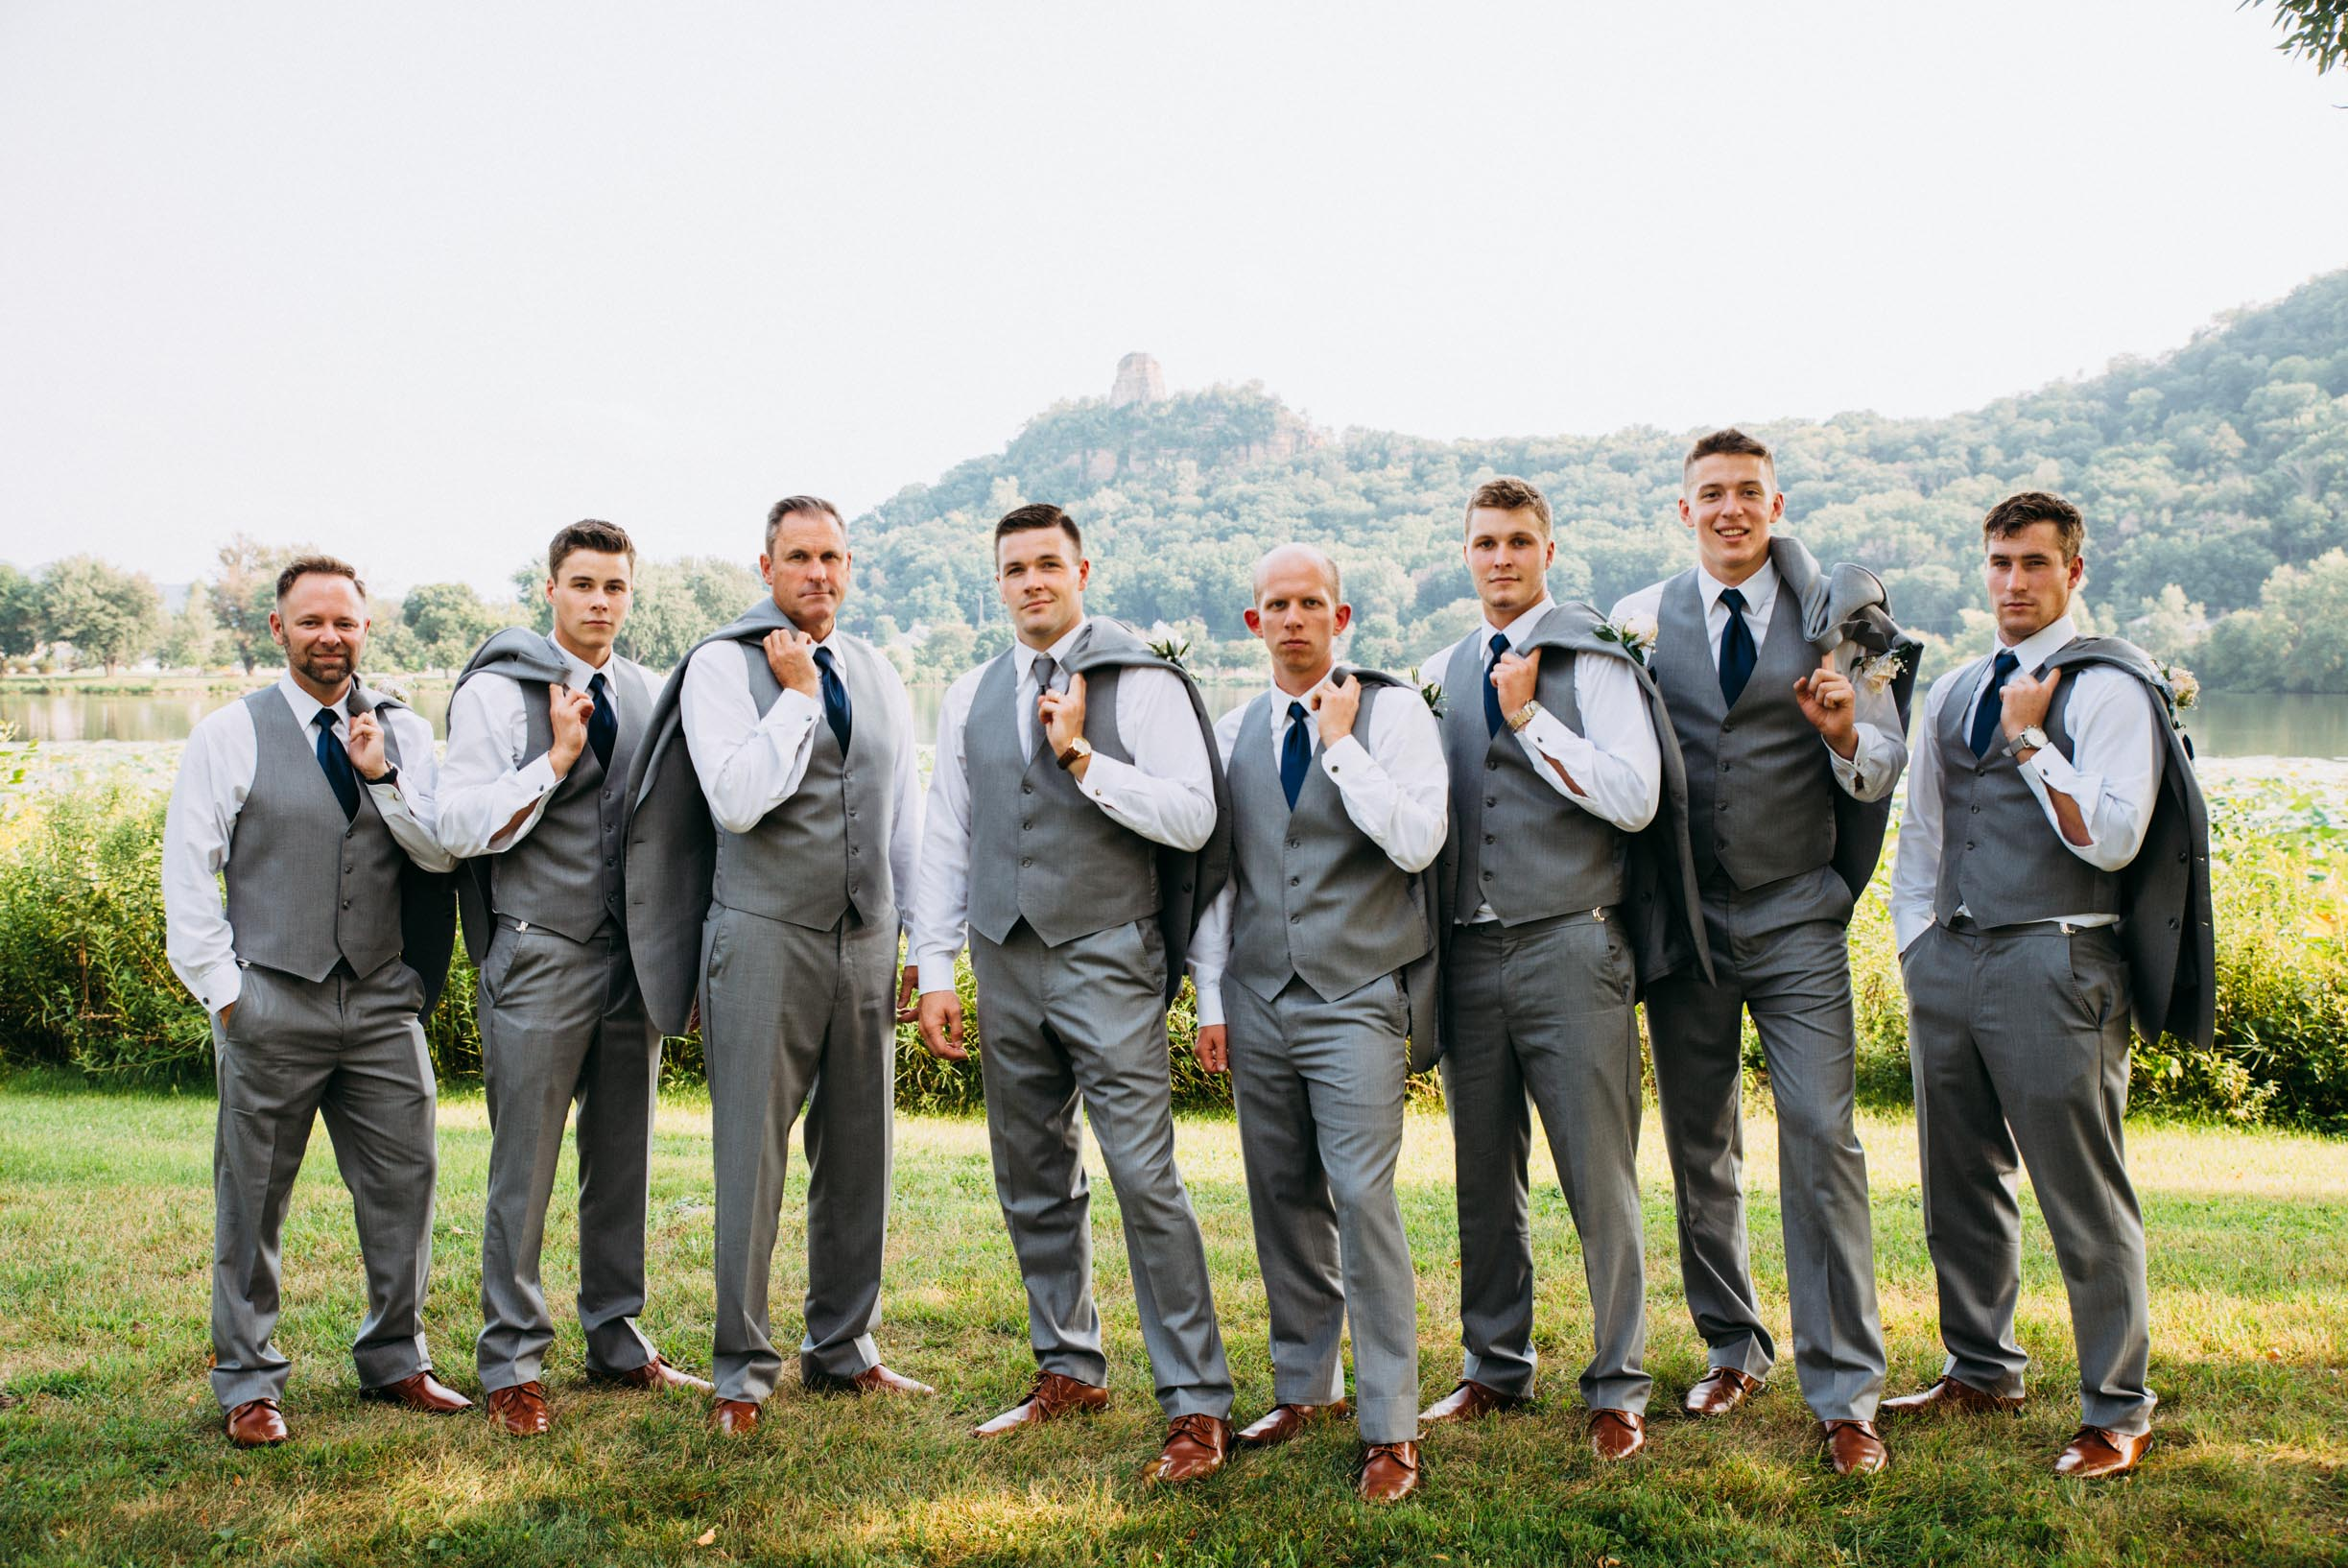 24-Lindsey Jake Wedding Wedding Party Portraits Winona.jpg